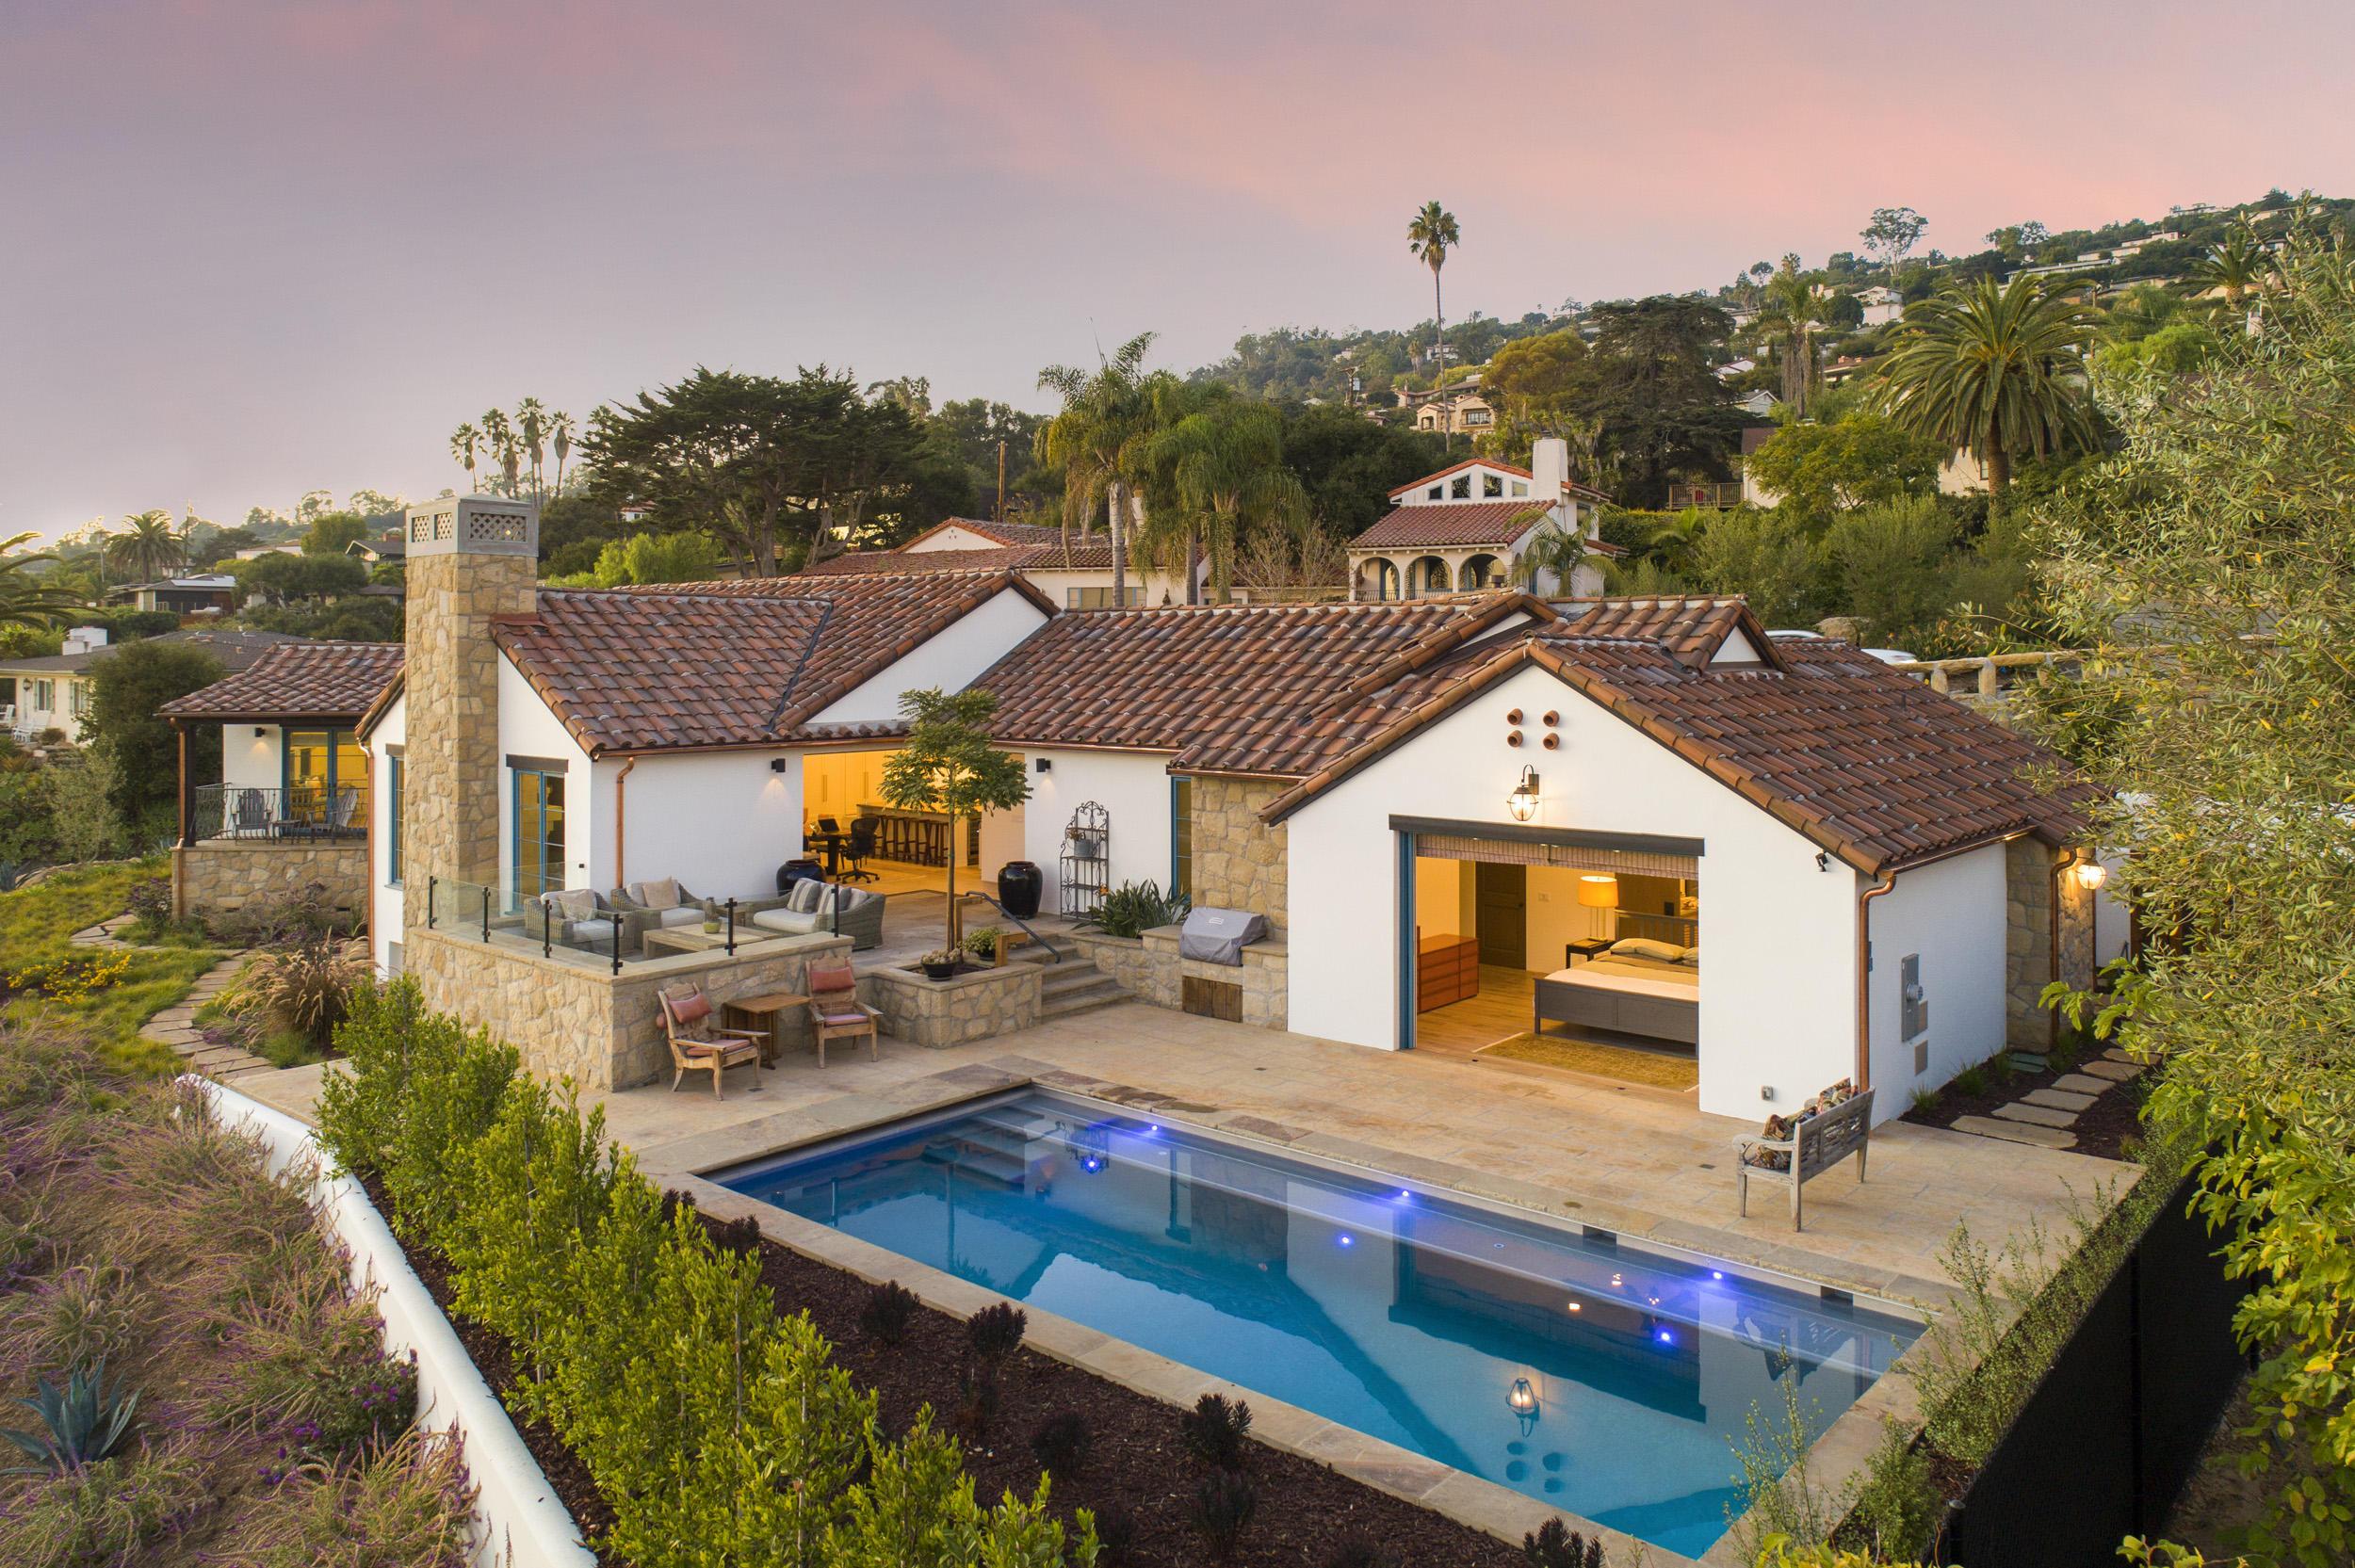 1110 Ferrelo Rd - Santa Barbara East of State, California